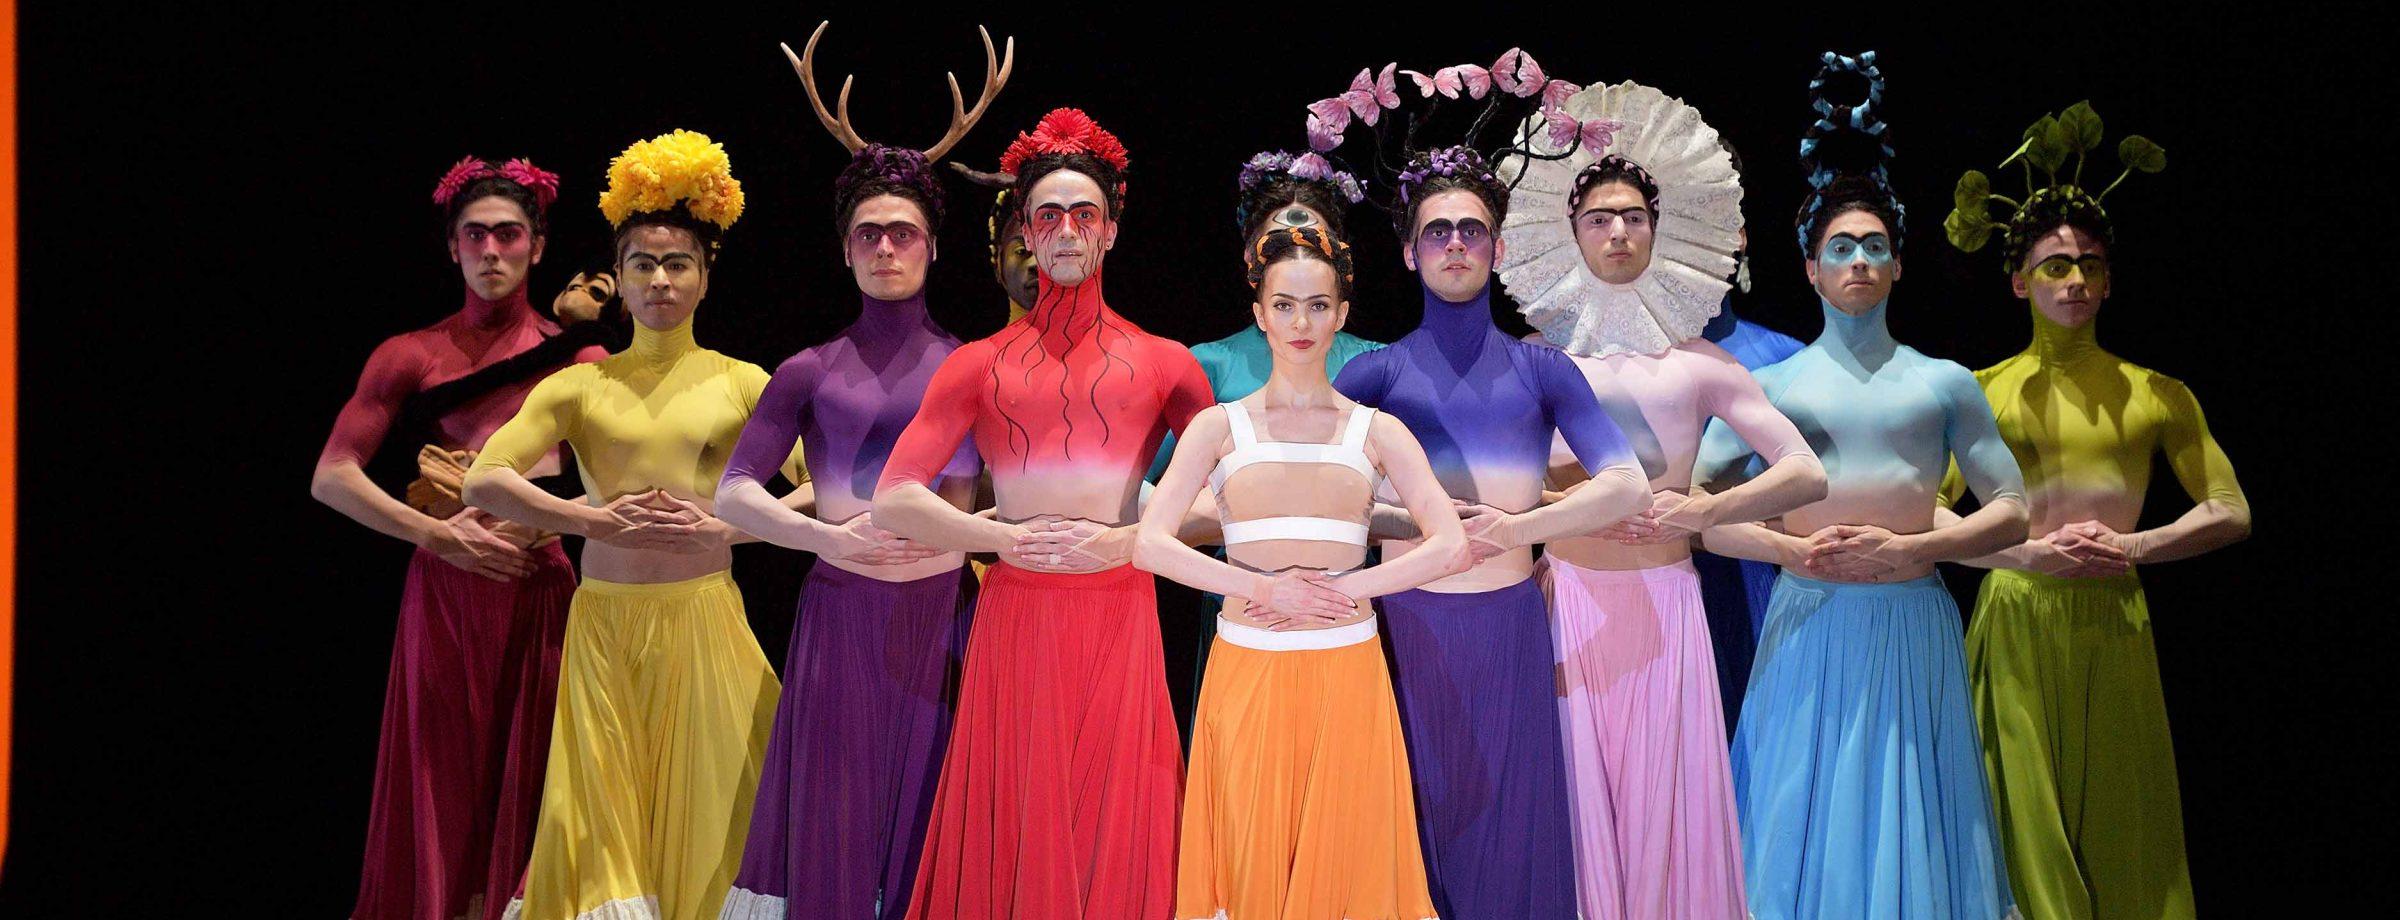 WEB---Katja-Khaniukova-as-Frida-with-ENB-Artists-in-Annabelle-Lopez-Ochoa's-Broken-Wings-(c)-Laurent-Liotardo